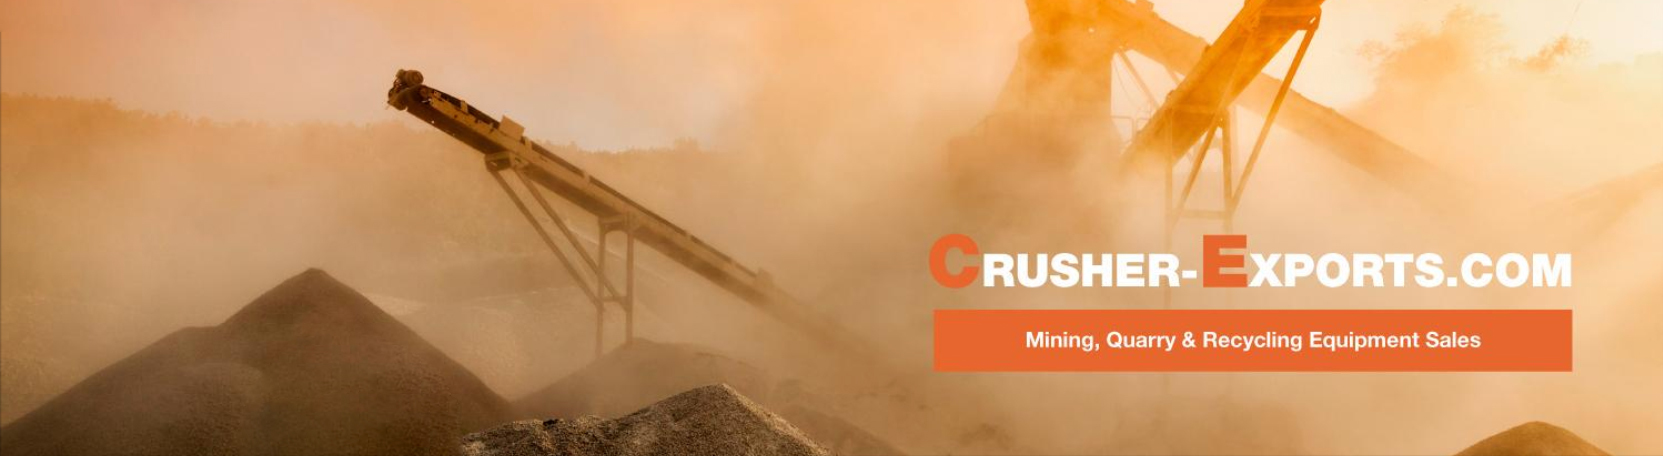 Crusher-Exports.com